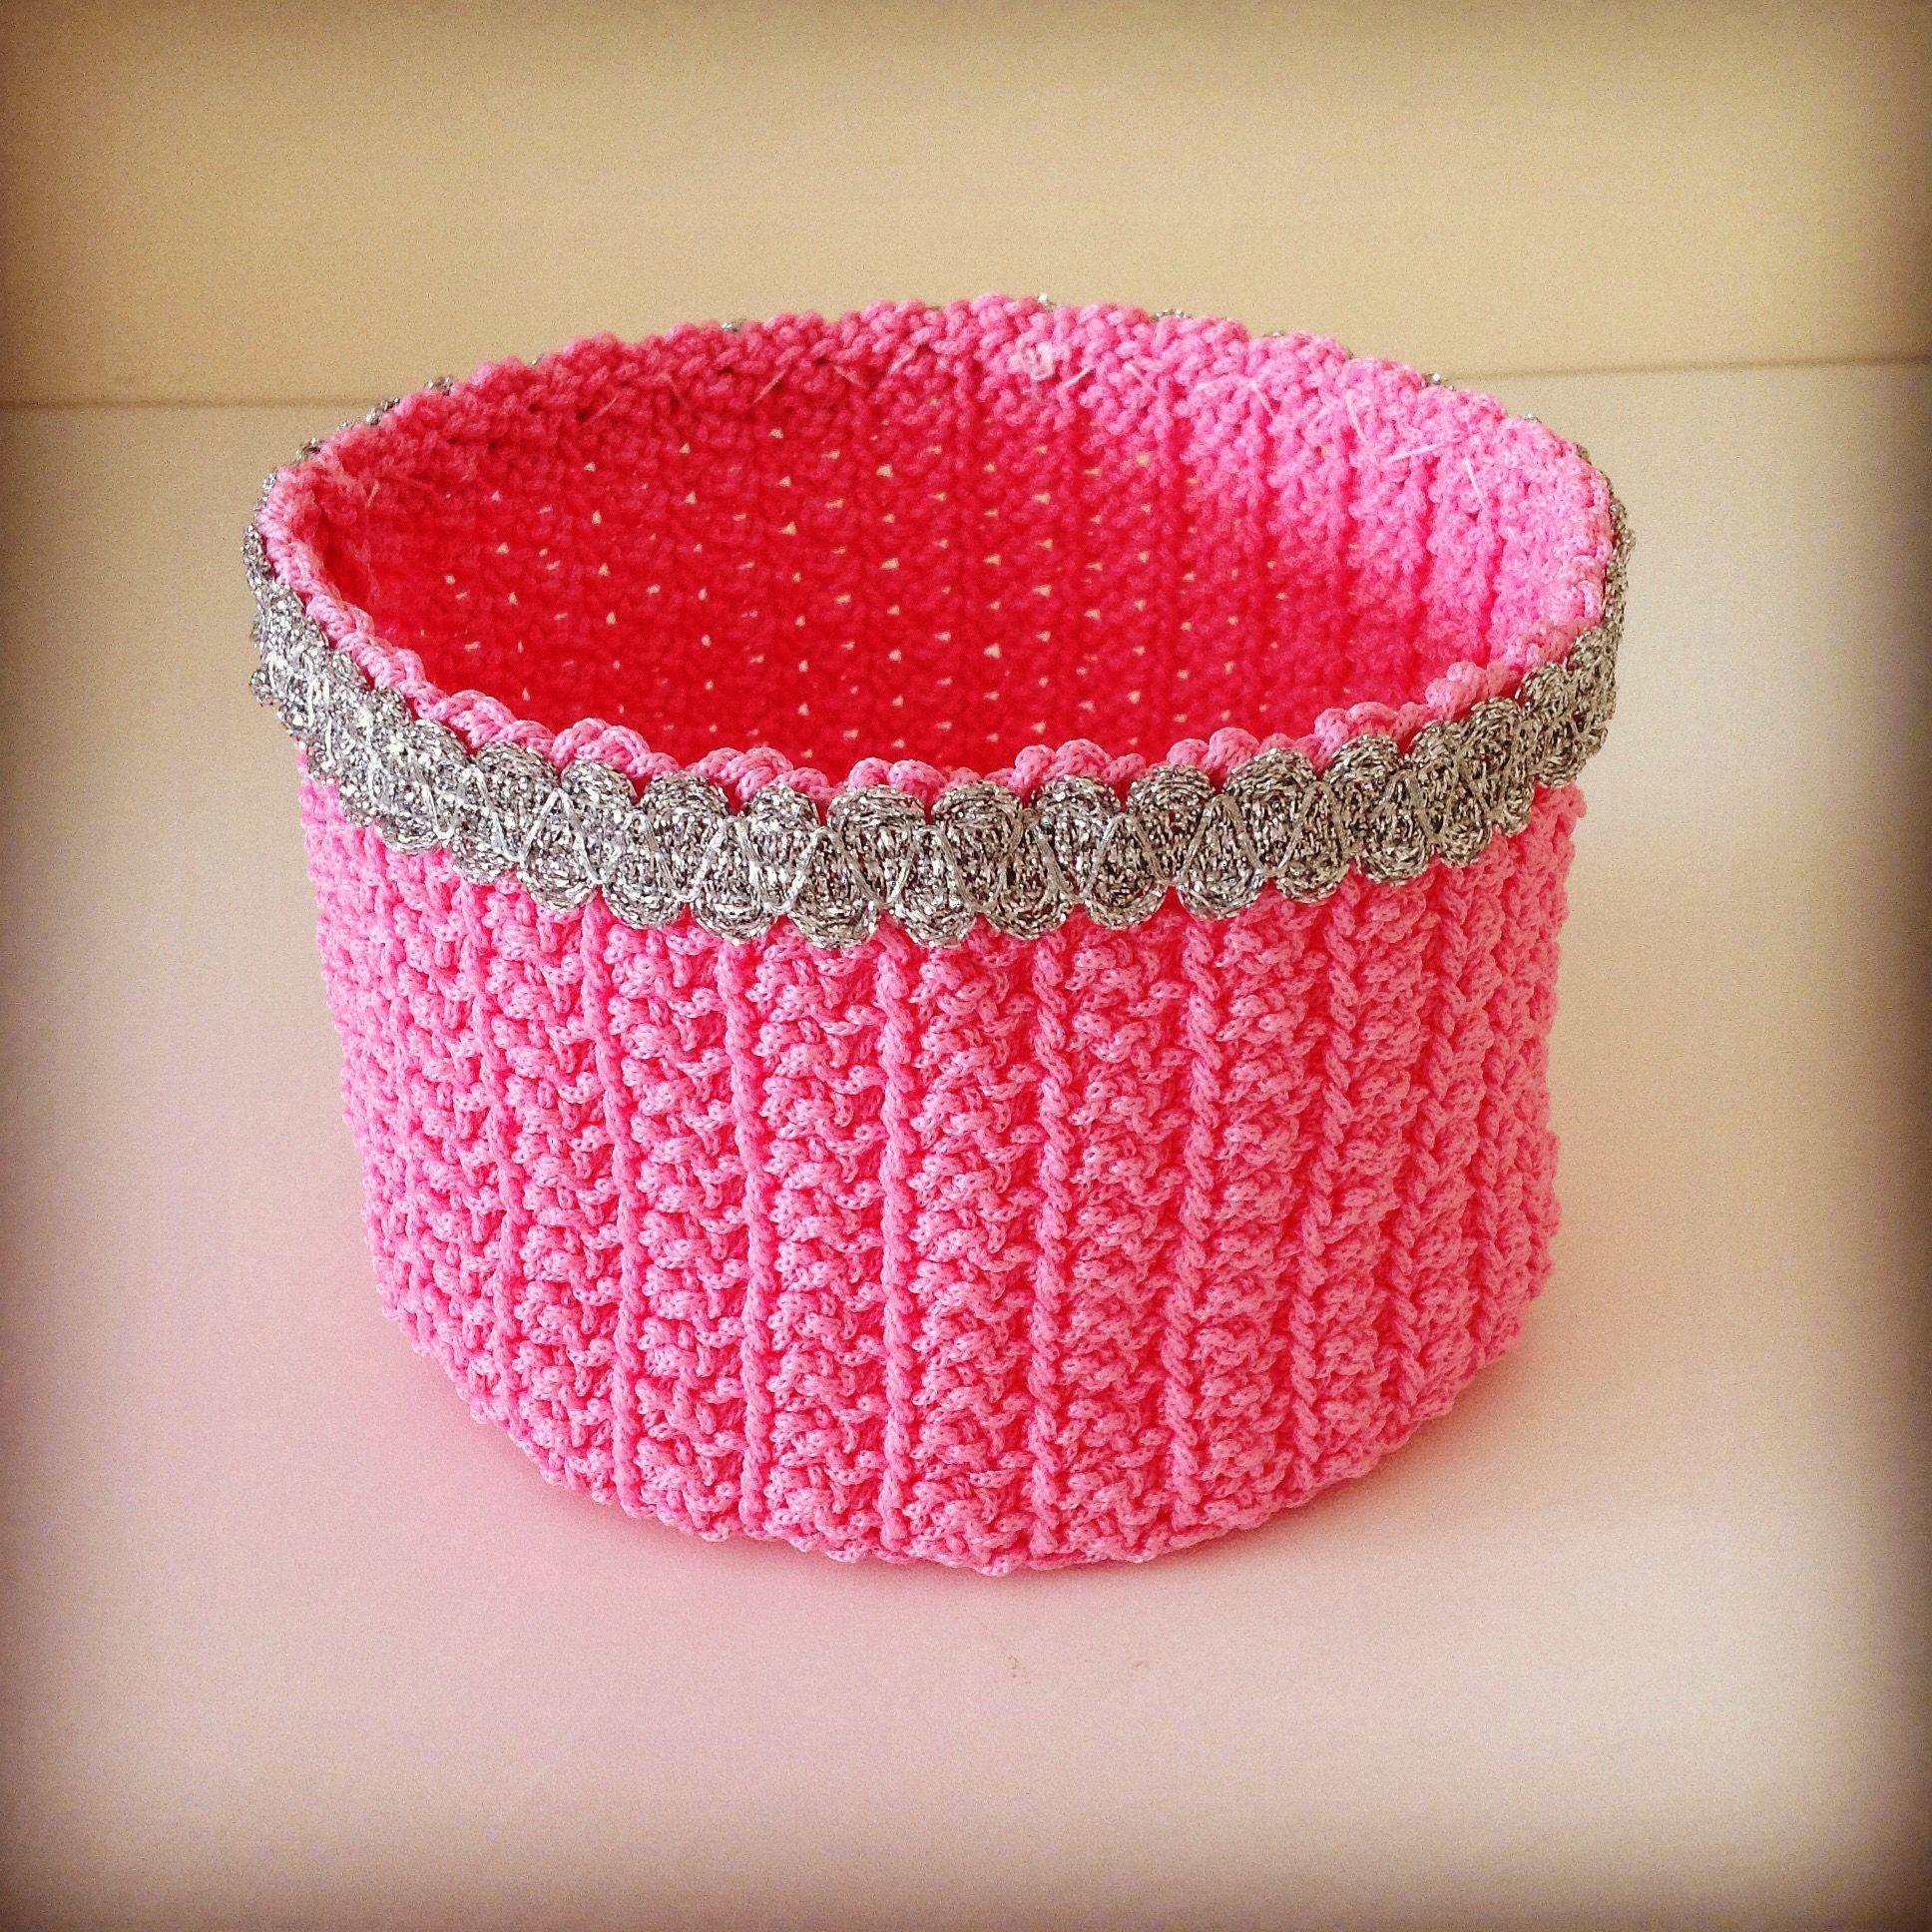 Sepet / knitted basket